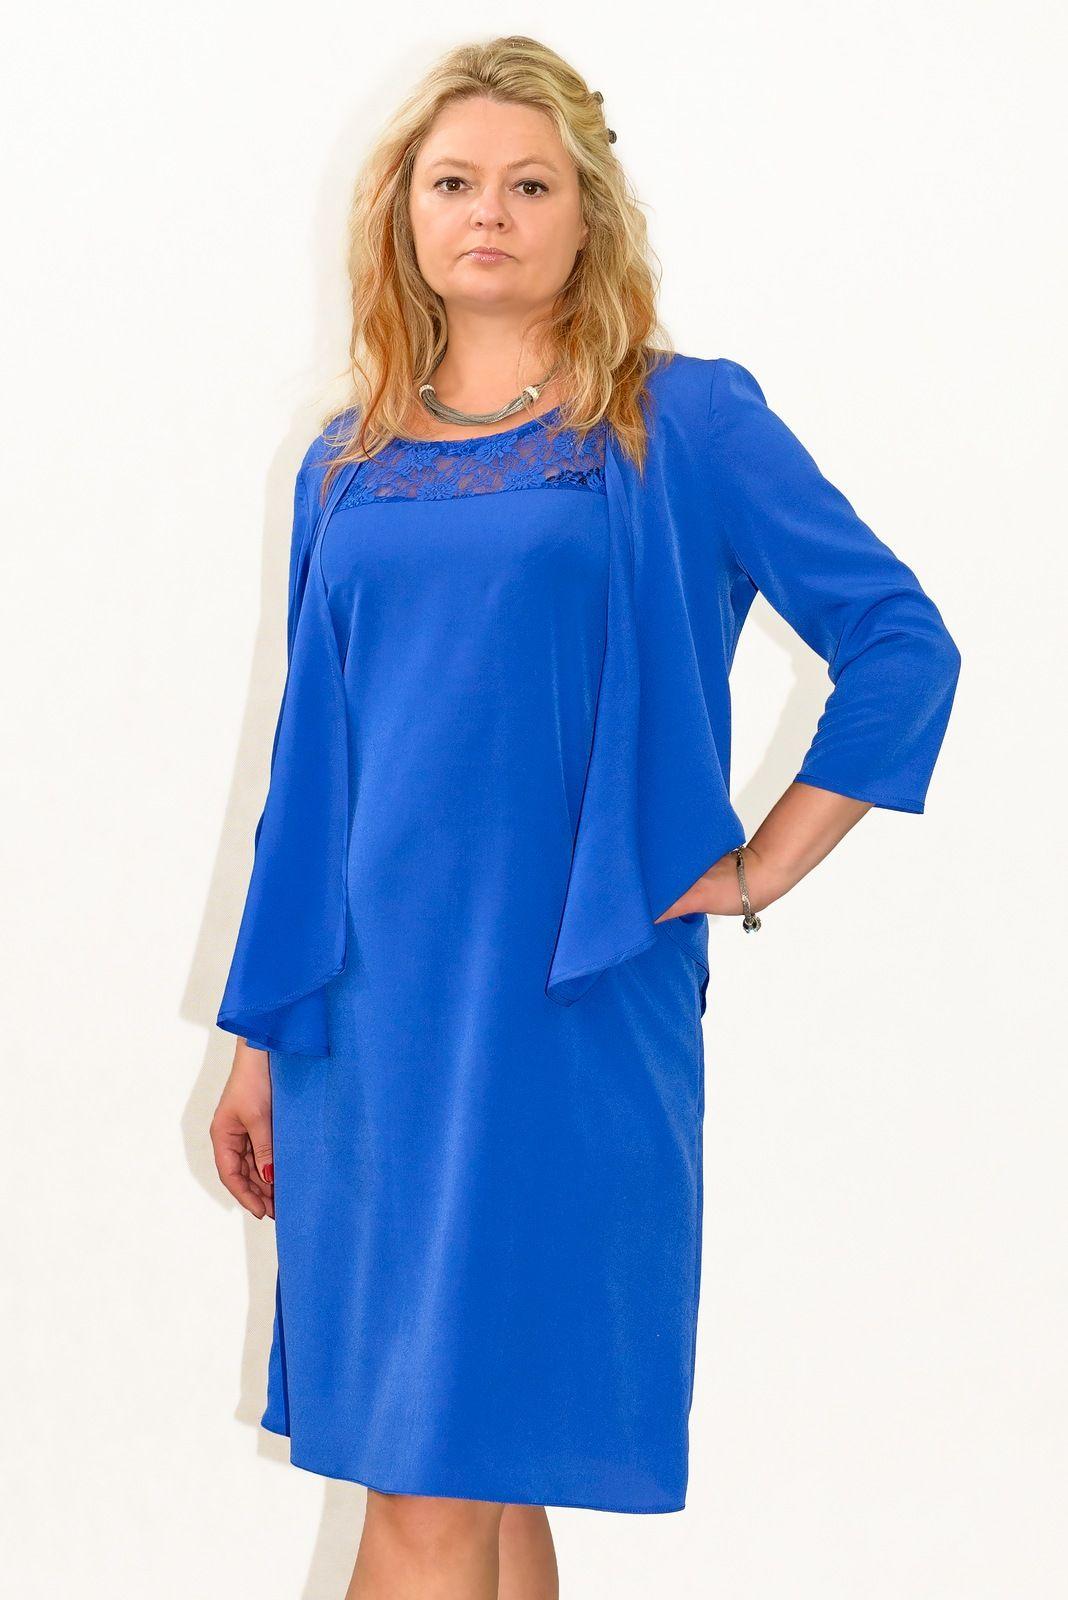 6d9225554a Elegancka sukienka XXL BELLFLOWER plus size 40-60 duże rozmiary BLUE ...